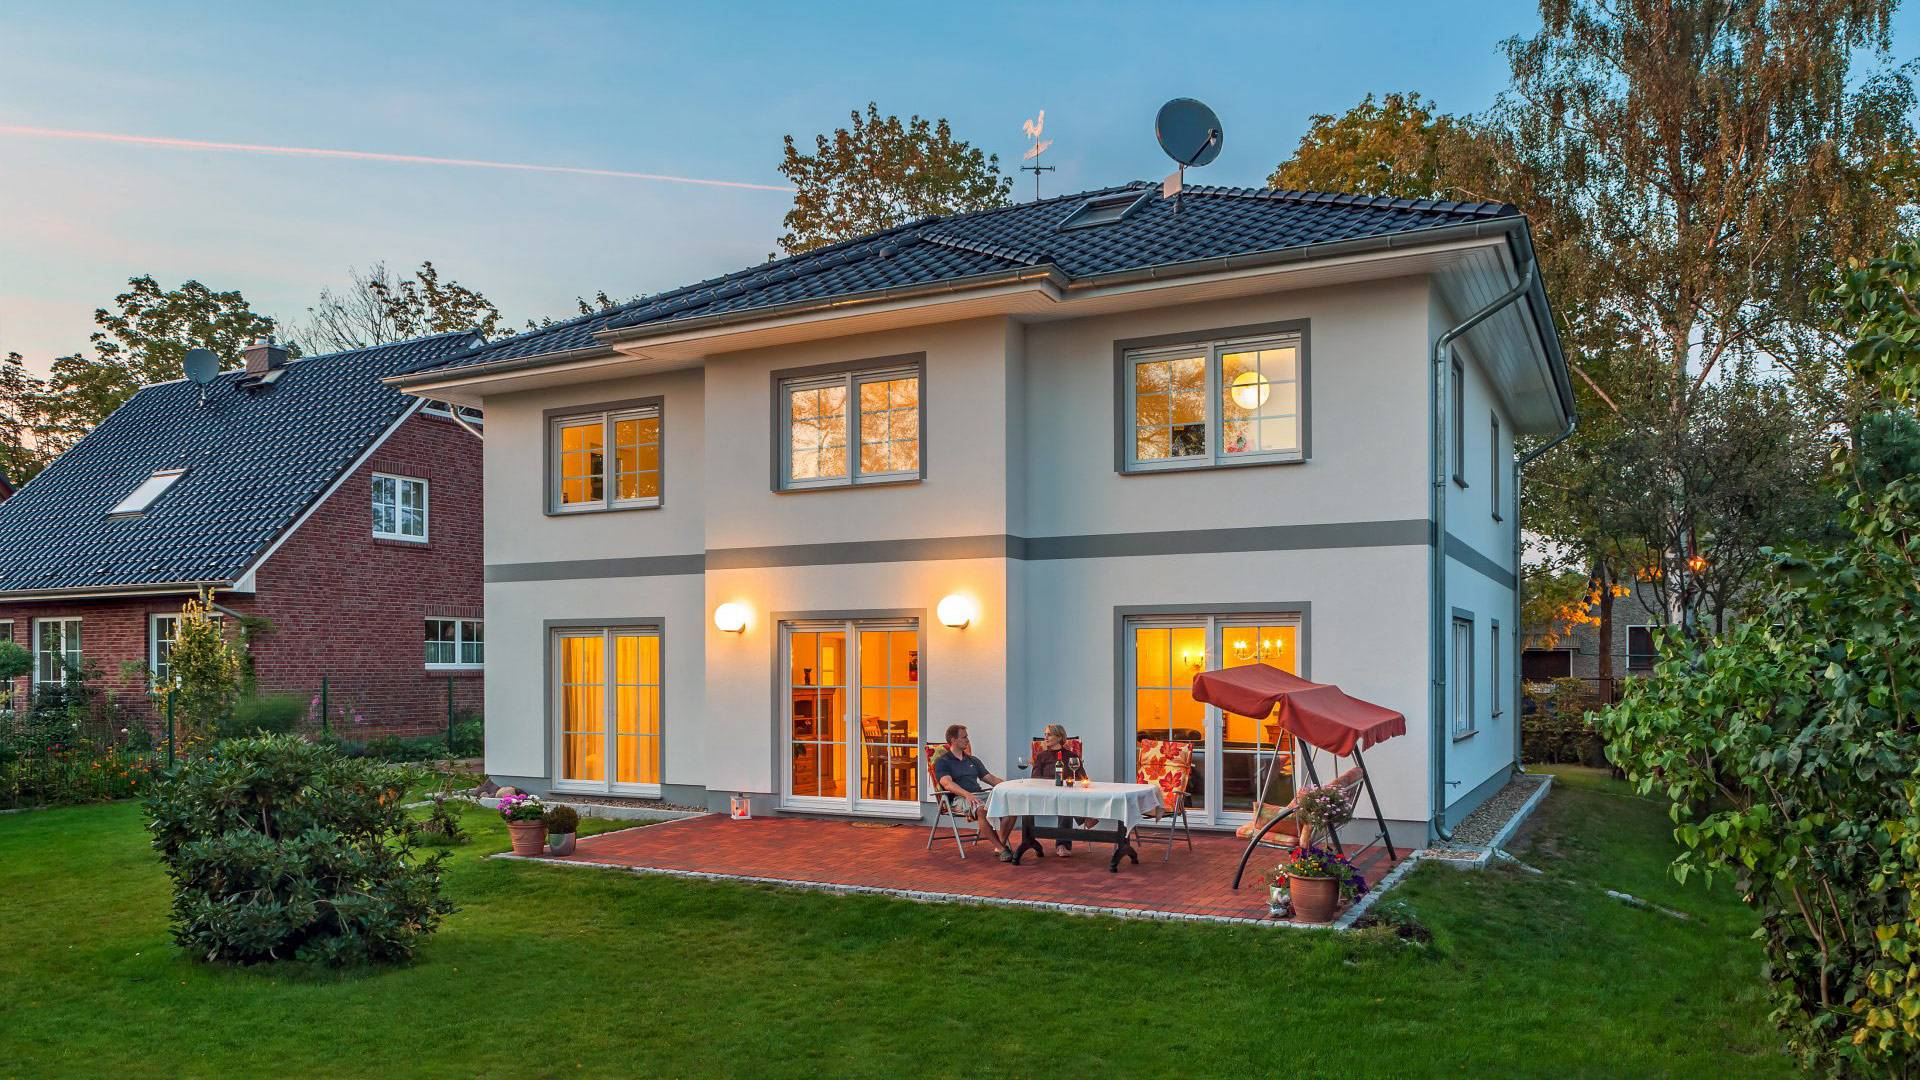 Hausbesichtigung Villa Laguna – ab 24.09.2016